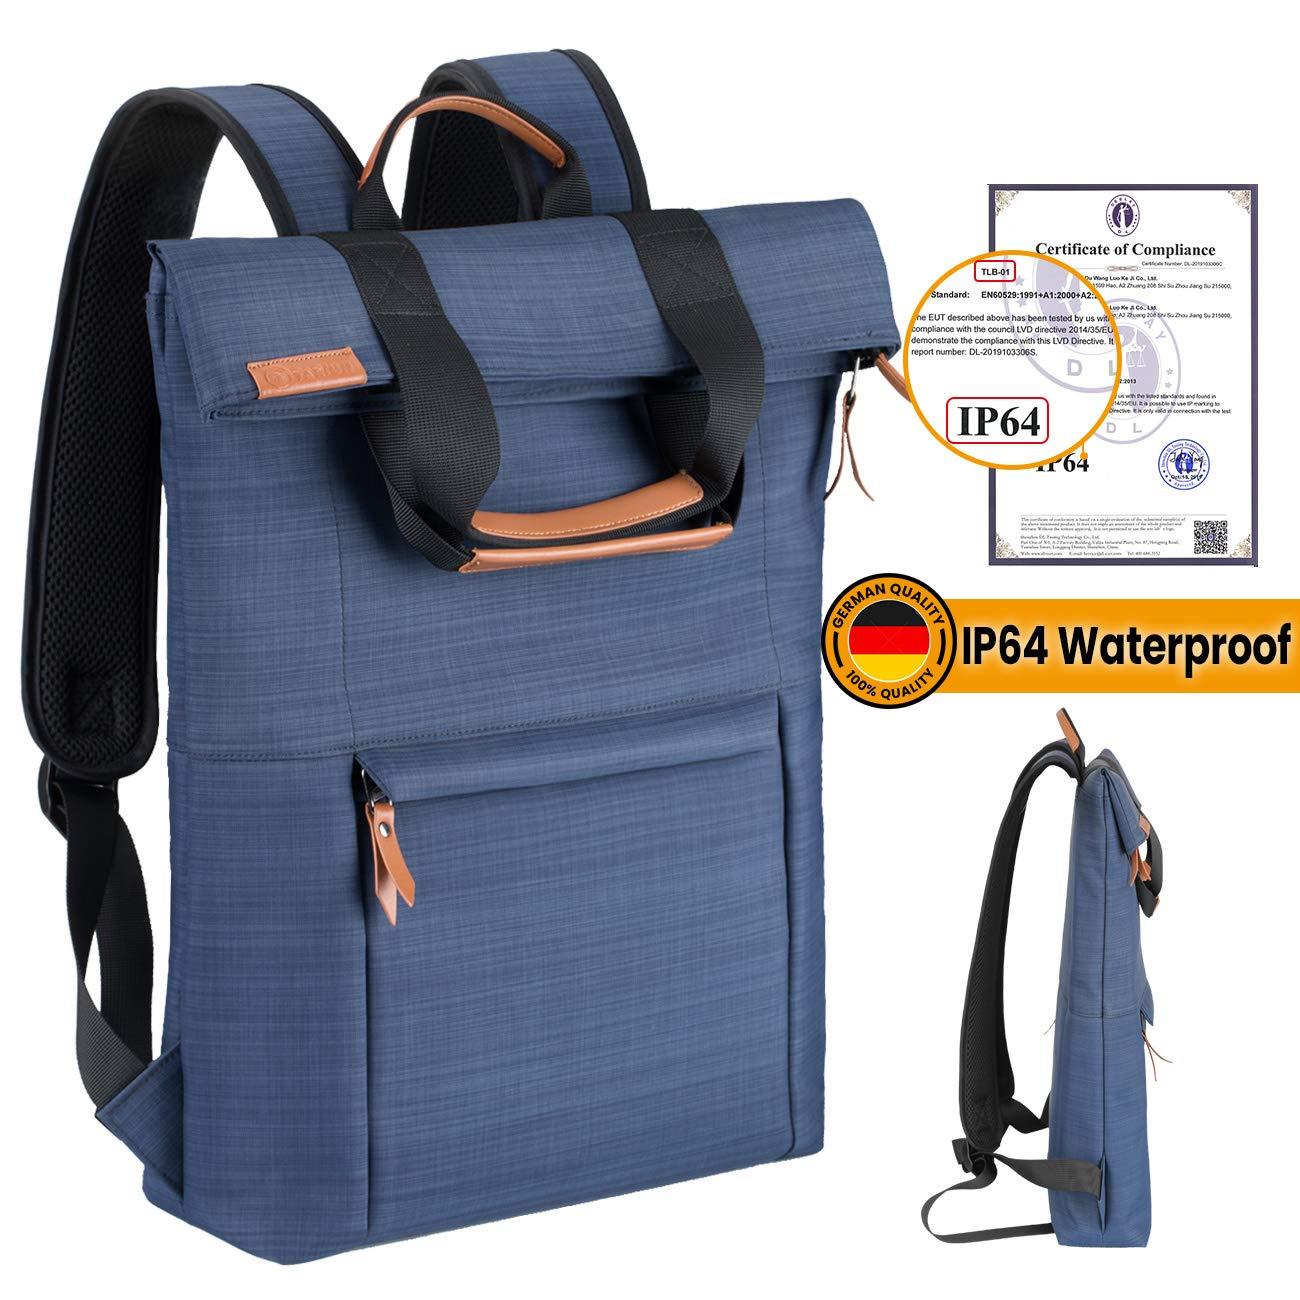 TARION Slim Laptop Backpack Lightweight Stylish School Computer Backpack IP64 Waterproof for Travel Business College Women Men Fits 15.6 Inch Laptop